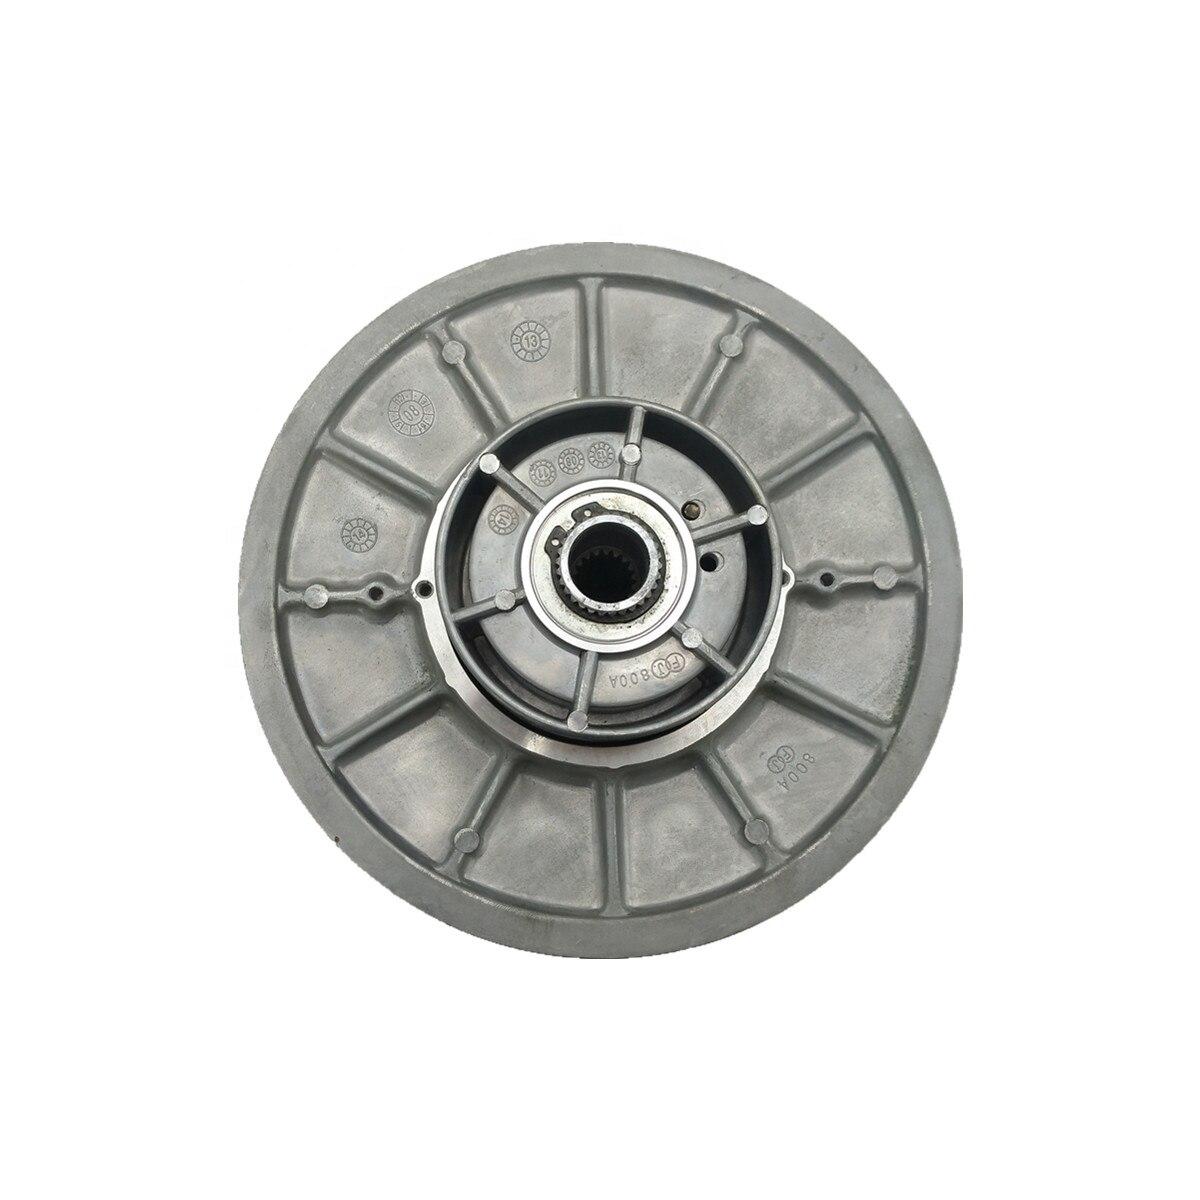 Polaris Driven Clutch secondary clutch parts Assy 1322190 enlarge